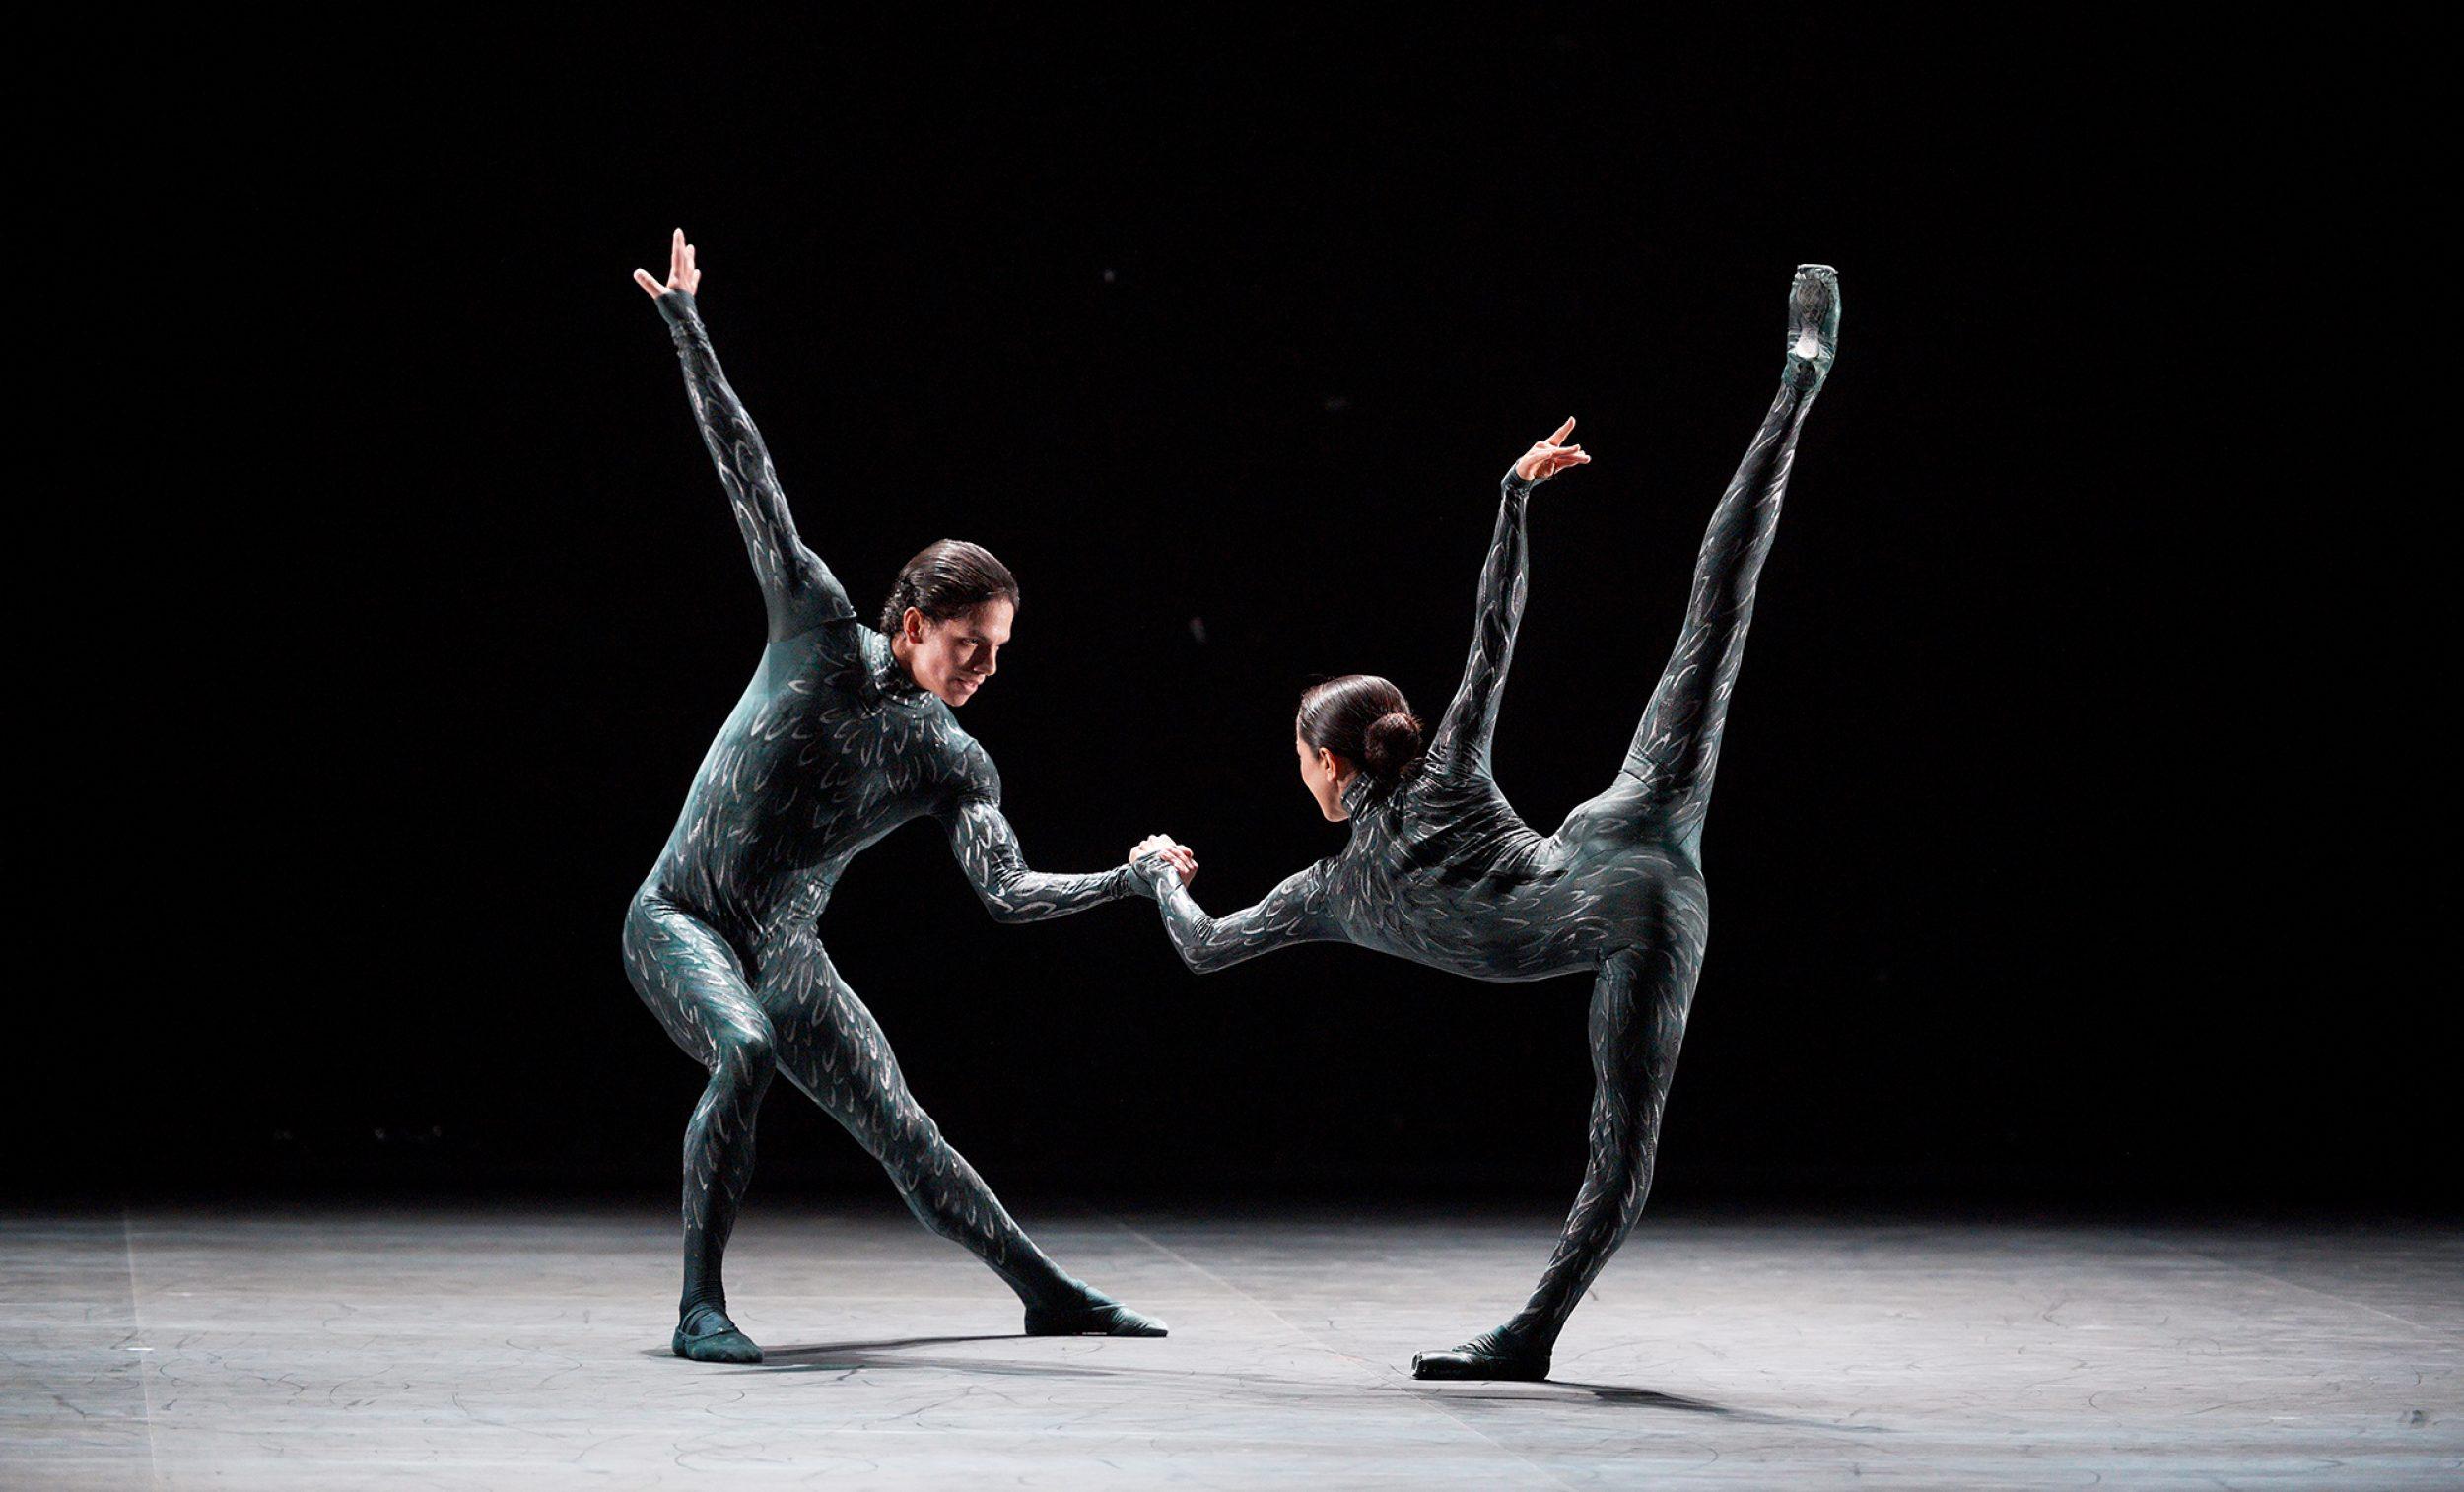 PRESS Erina-Takahashi-and-Isaac-Hernandez-in-Fantastic-Beings-by-Aszure-Barton-c-Laurent-Liotardo